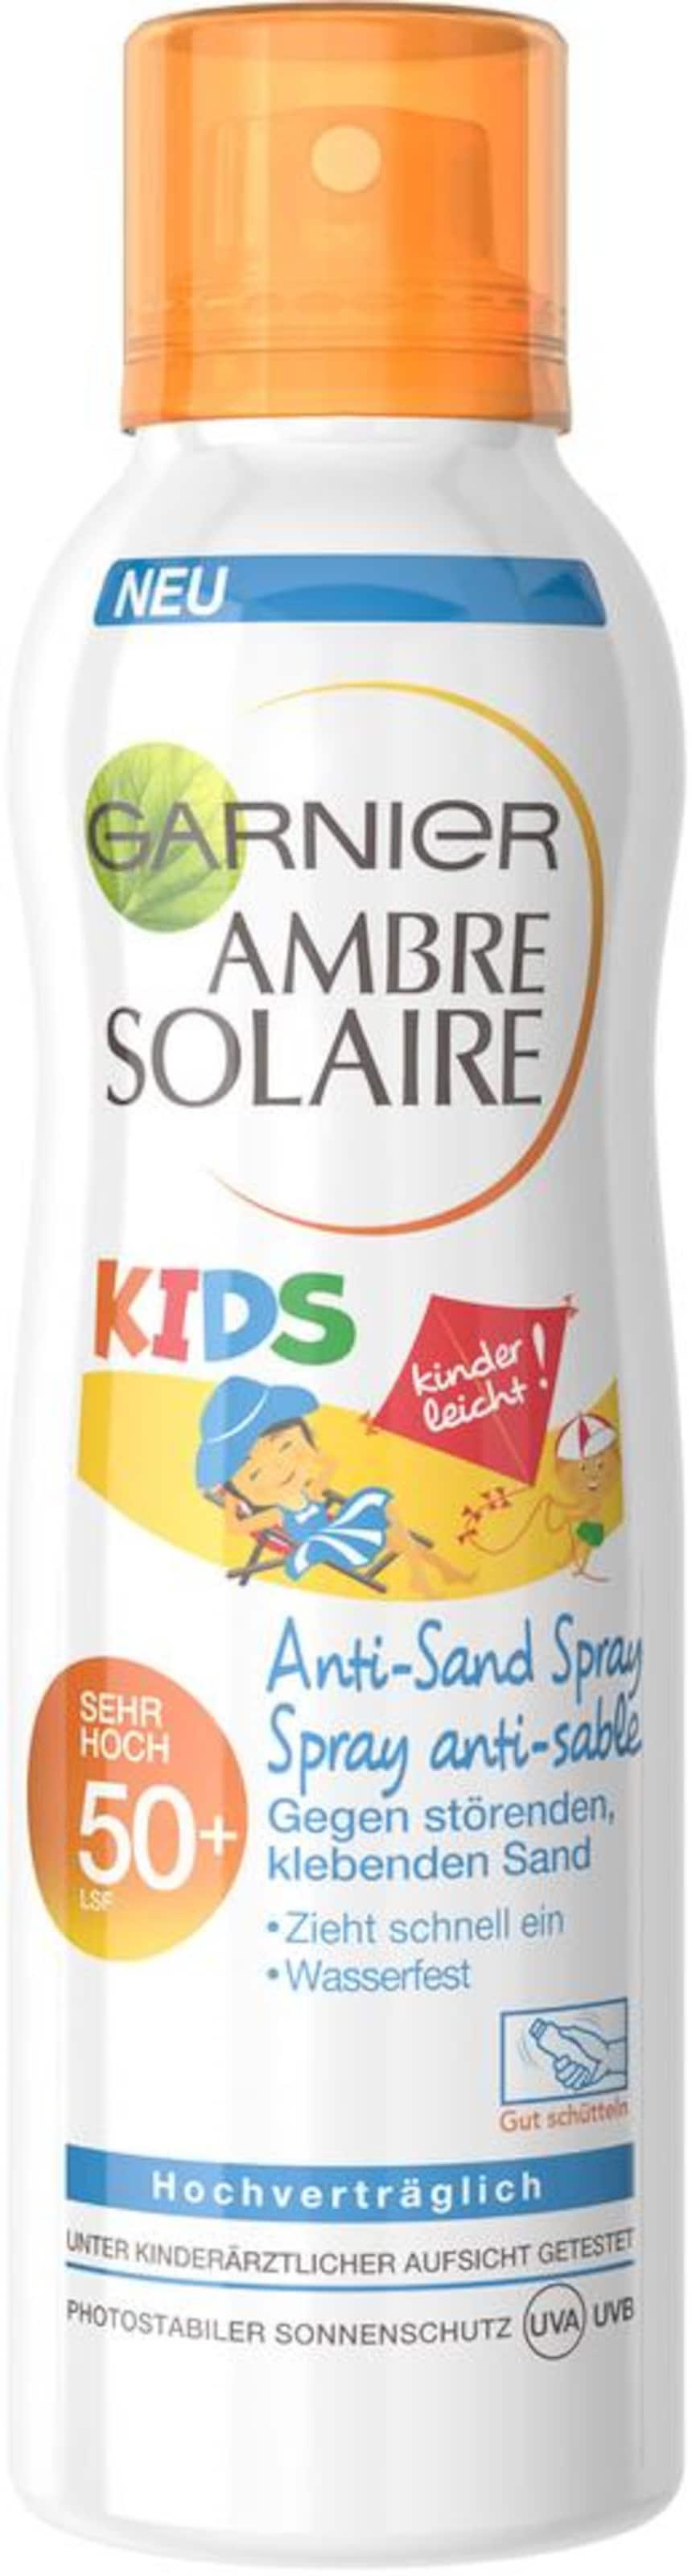 In sand Garnier Anti Ambre Solaire OrangeWeiß 50Sonnenspray Kids Lsf cL3Rq45Aj